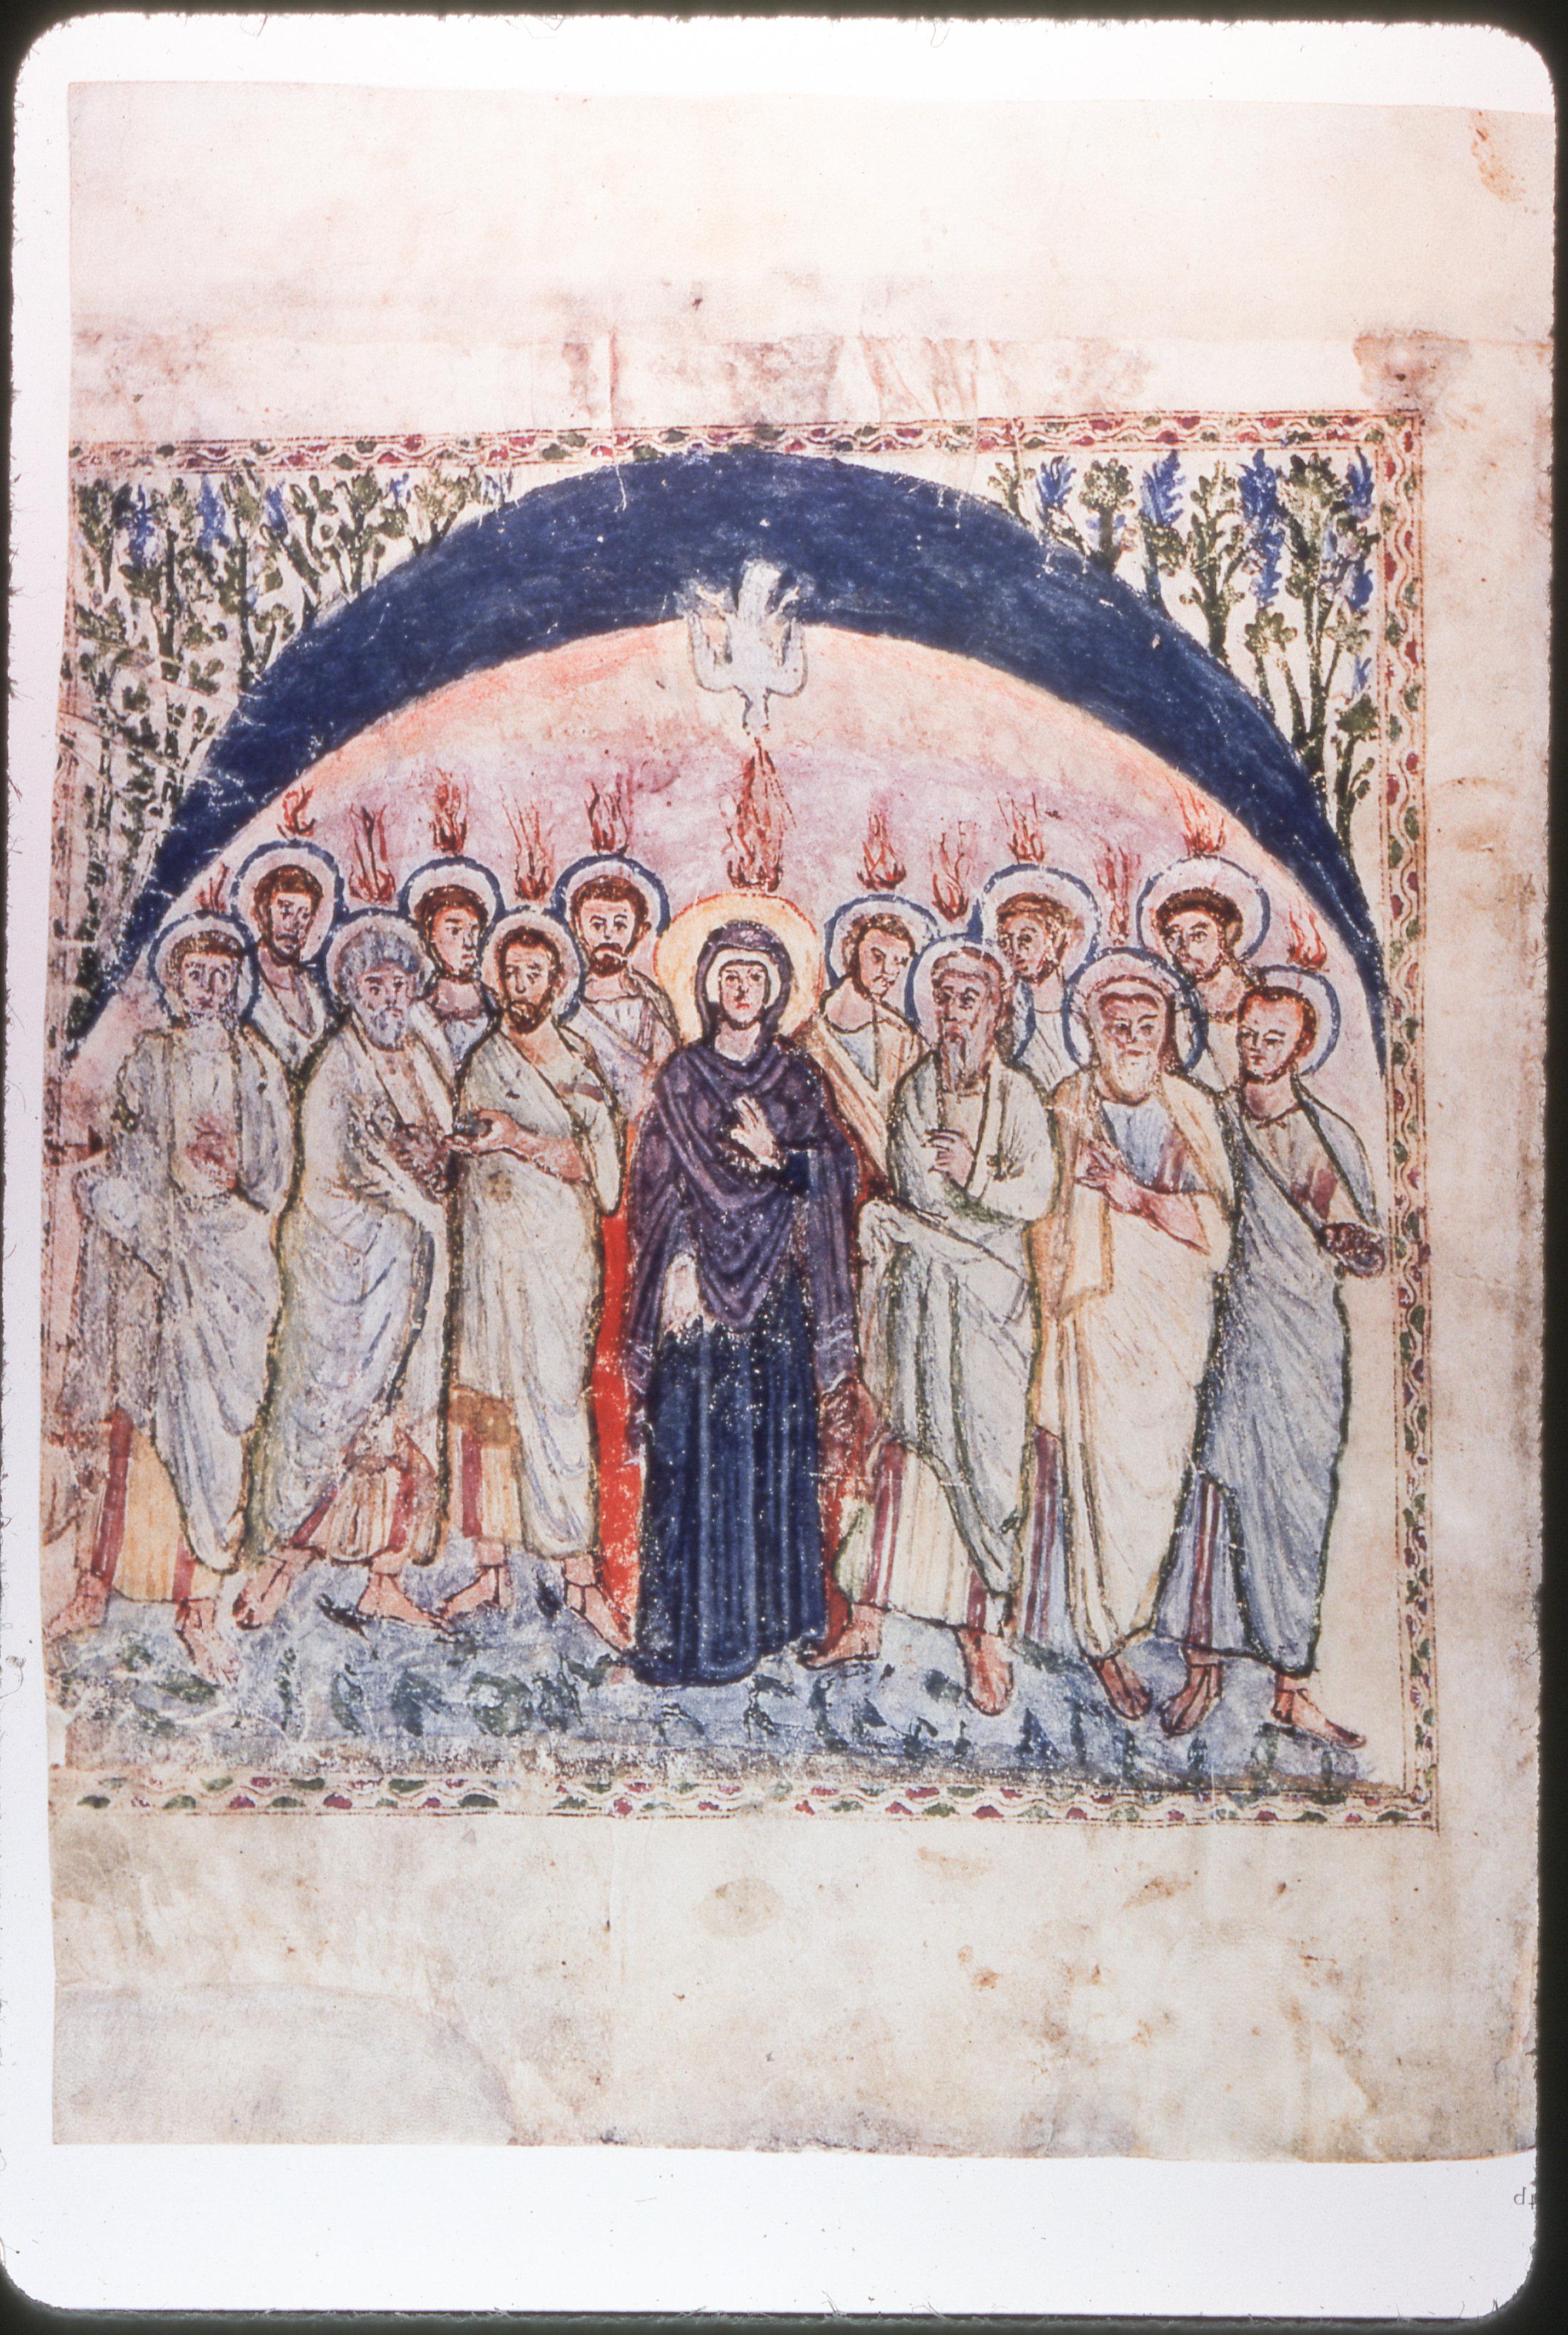 Mary and the Disciples at Pentecost | Rabbula Gospels, fol. 14b | Image credit:  Everett Ferguson photo collection